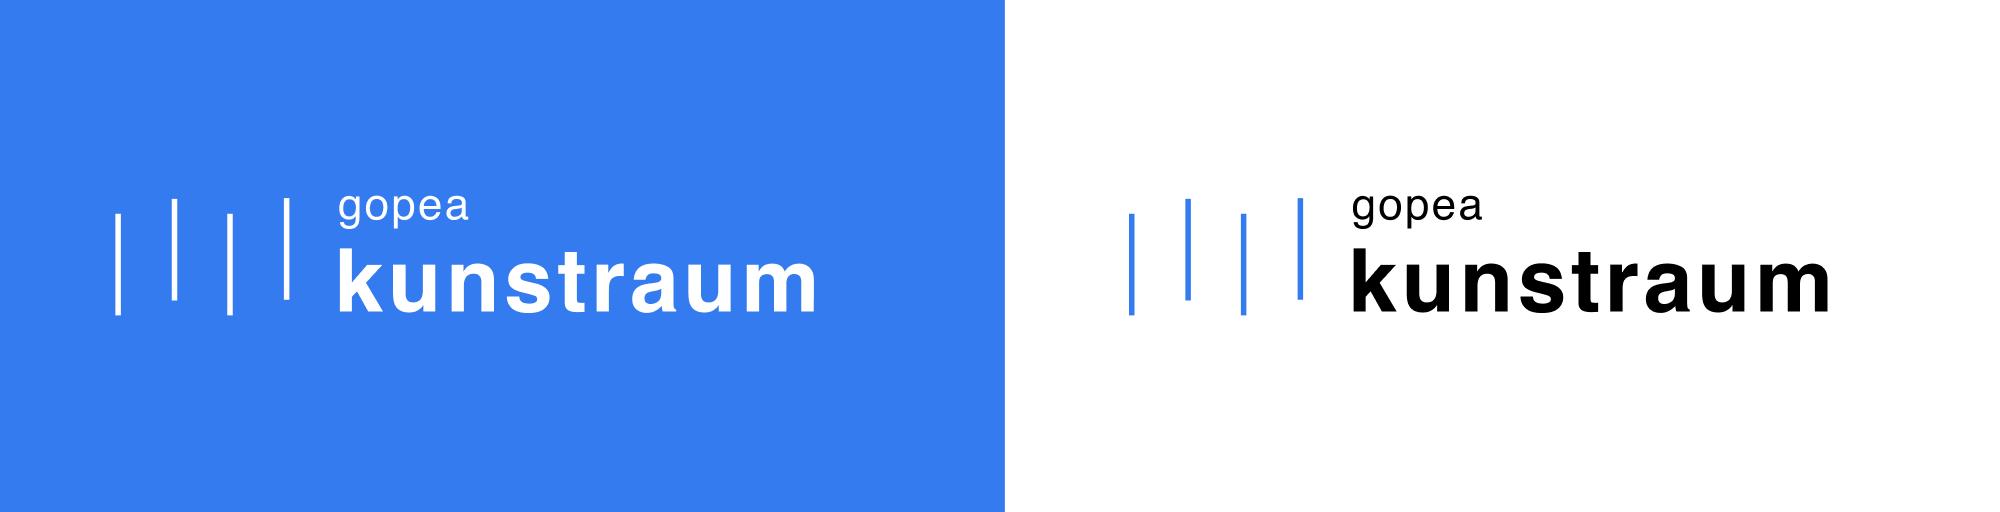 gopea-logo-1